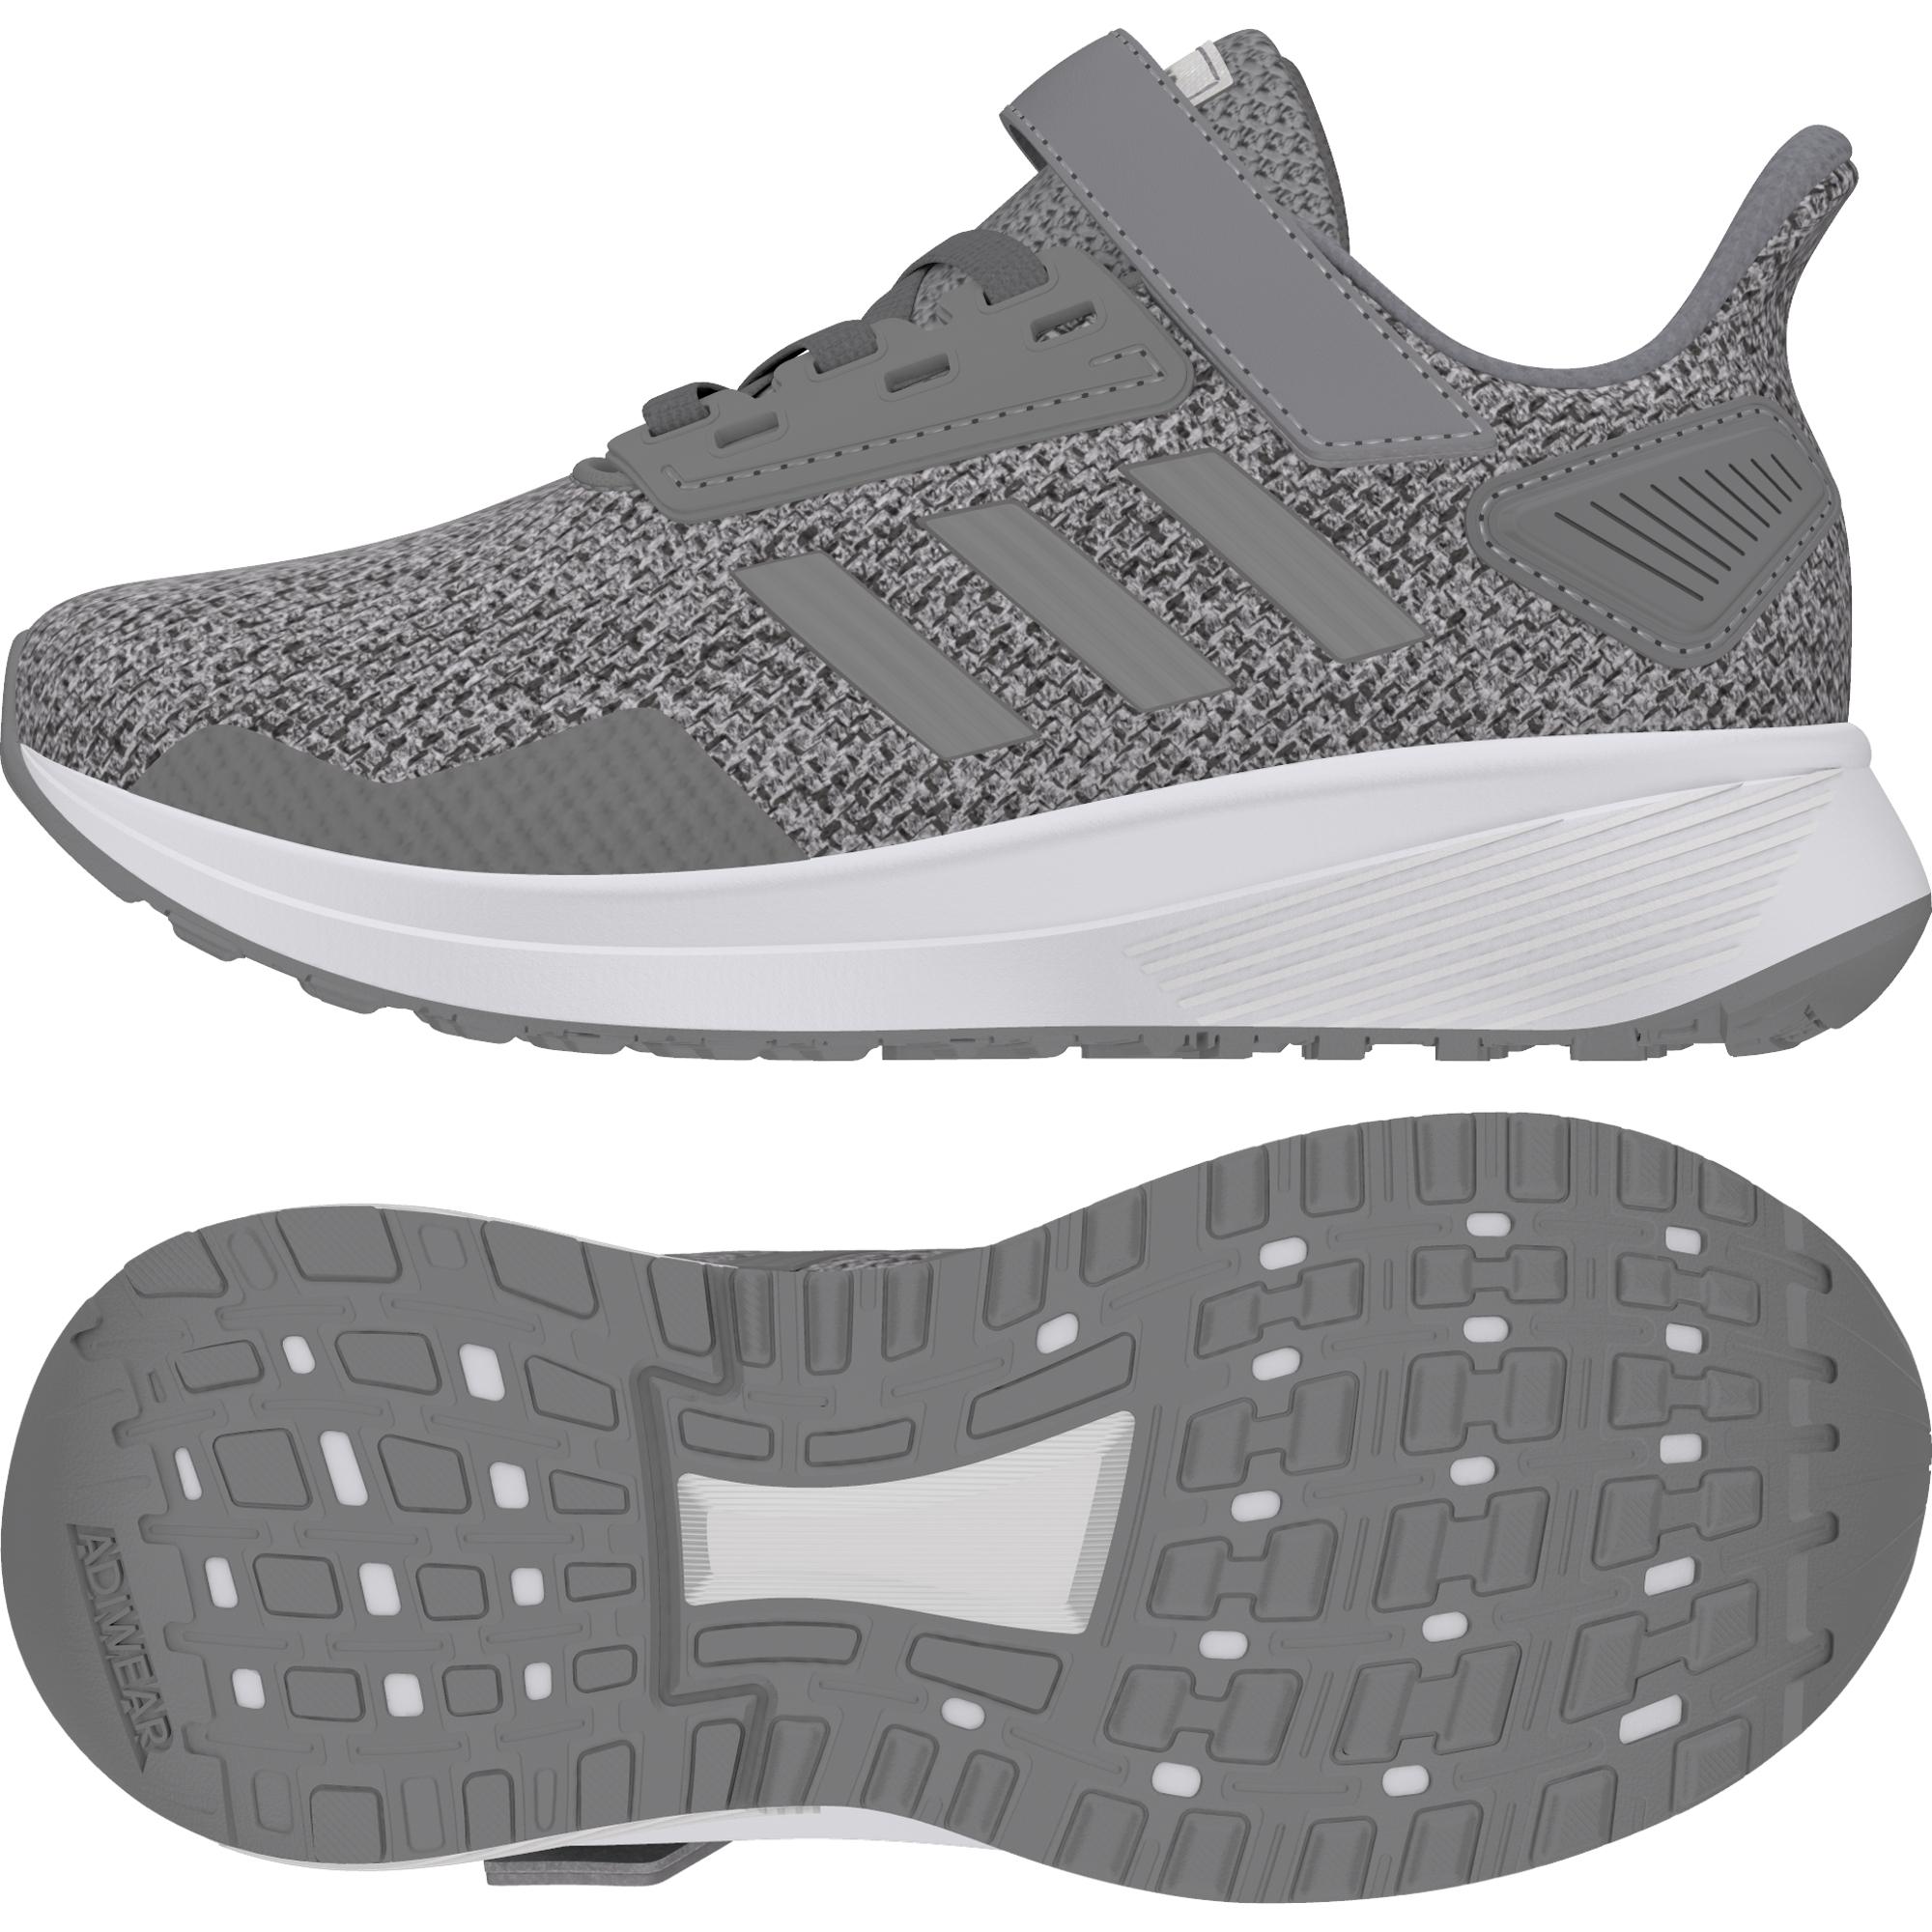 timeless design 4657a 844b6 Chaussures kid adidas Duramo 9